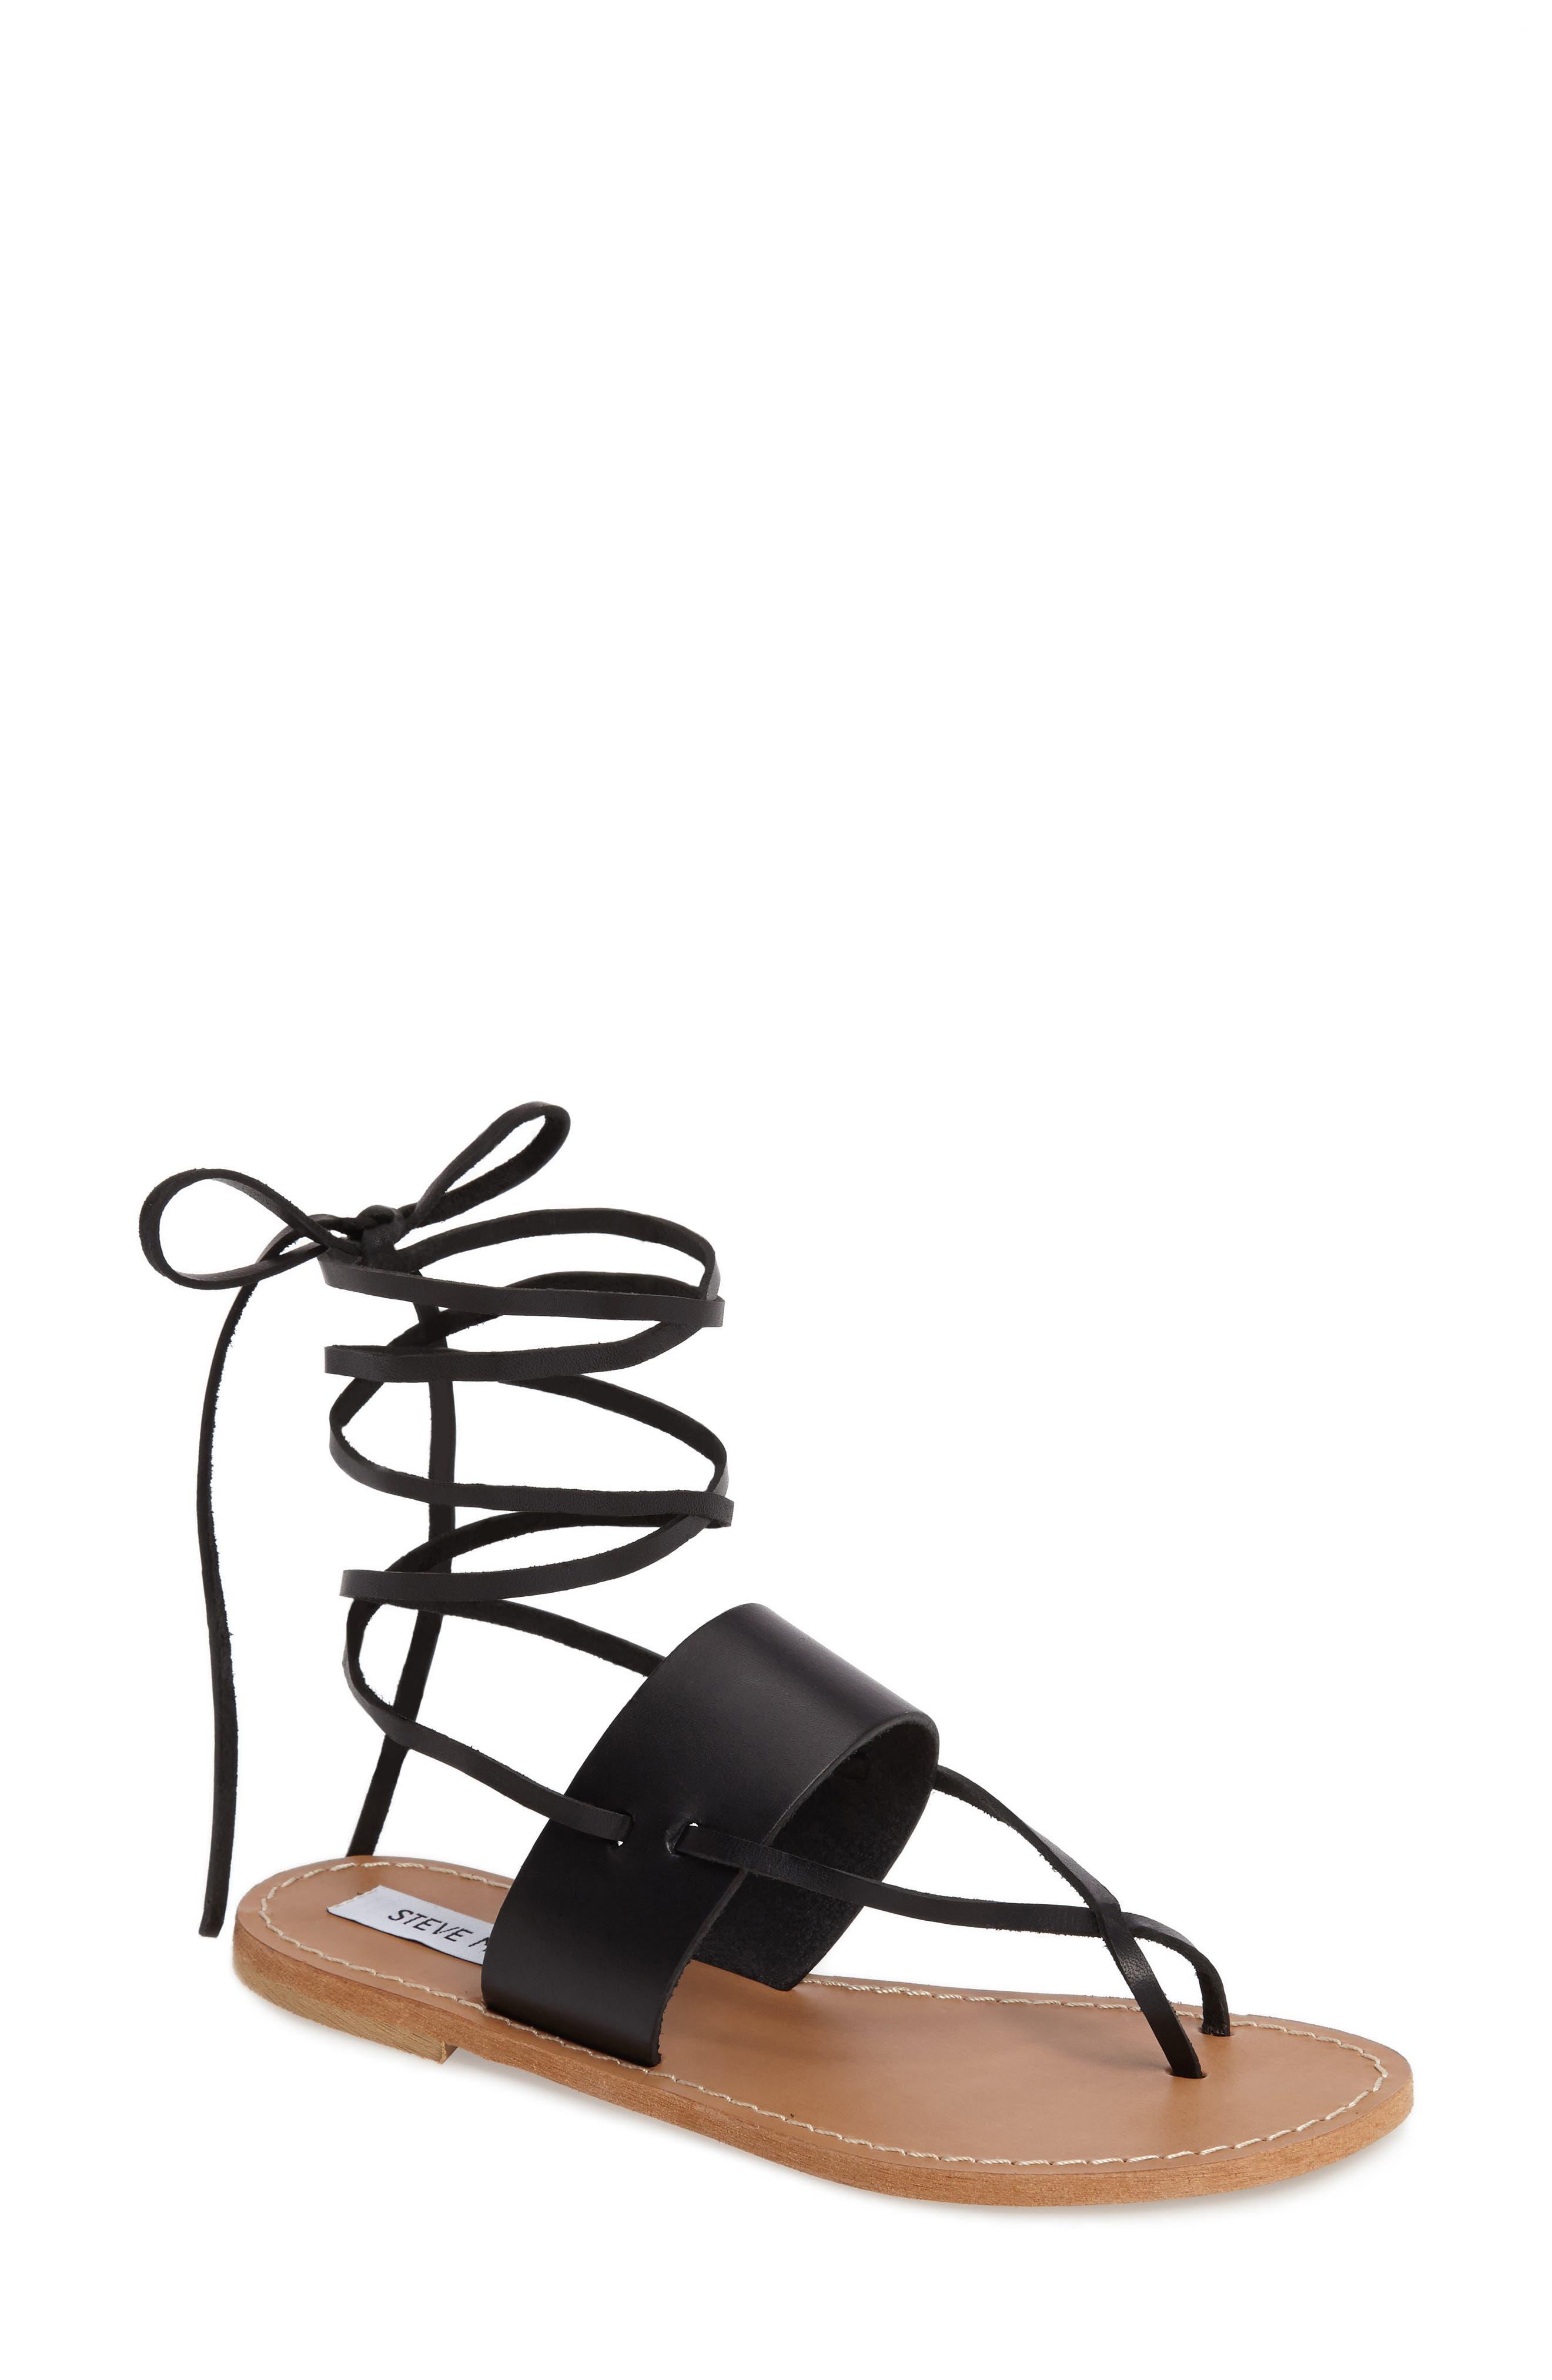 Bianca Lace-Up Sandal,                             Main thumbnail 1, color,                             001